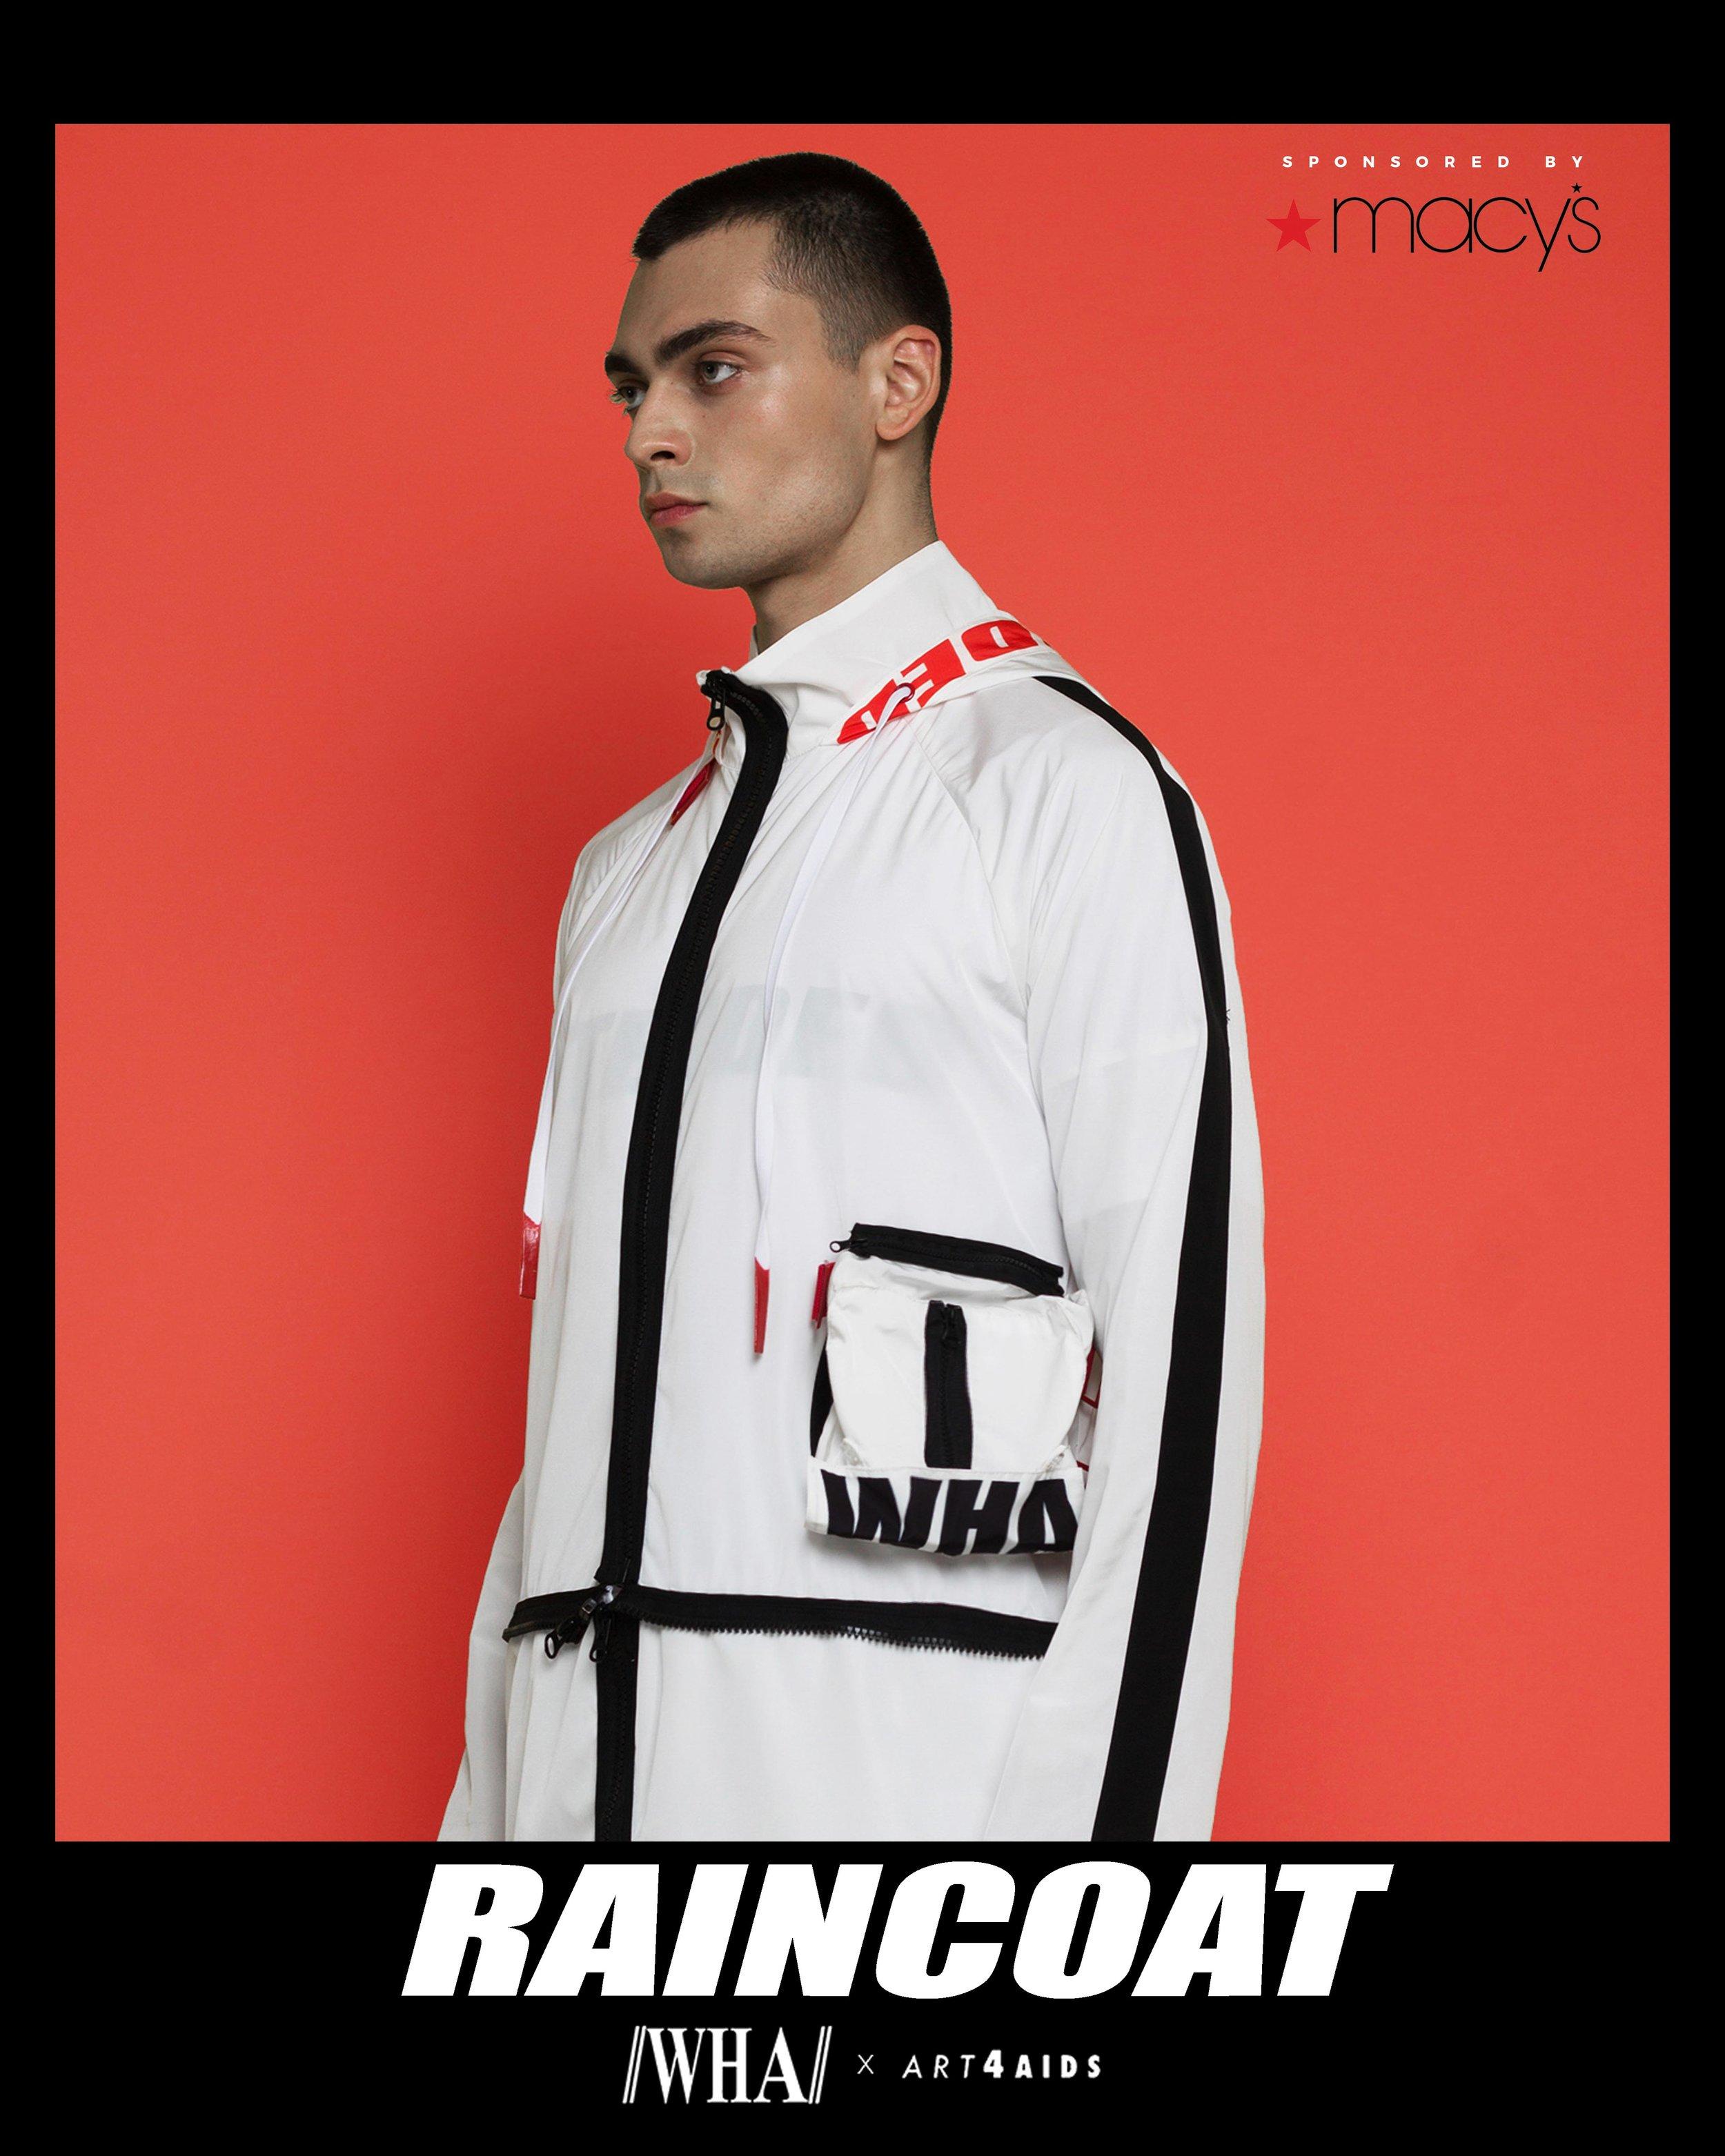 RAINCOAT 4.jpg